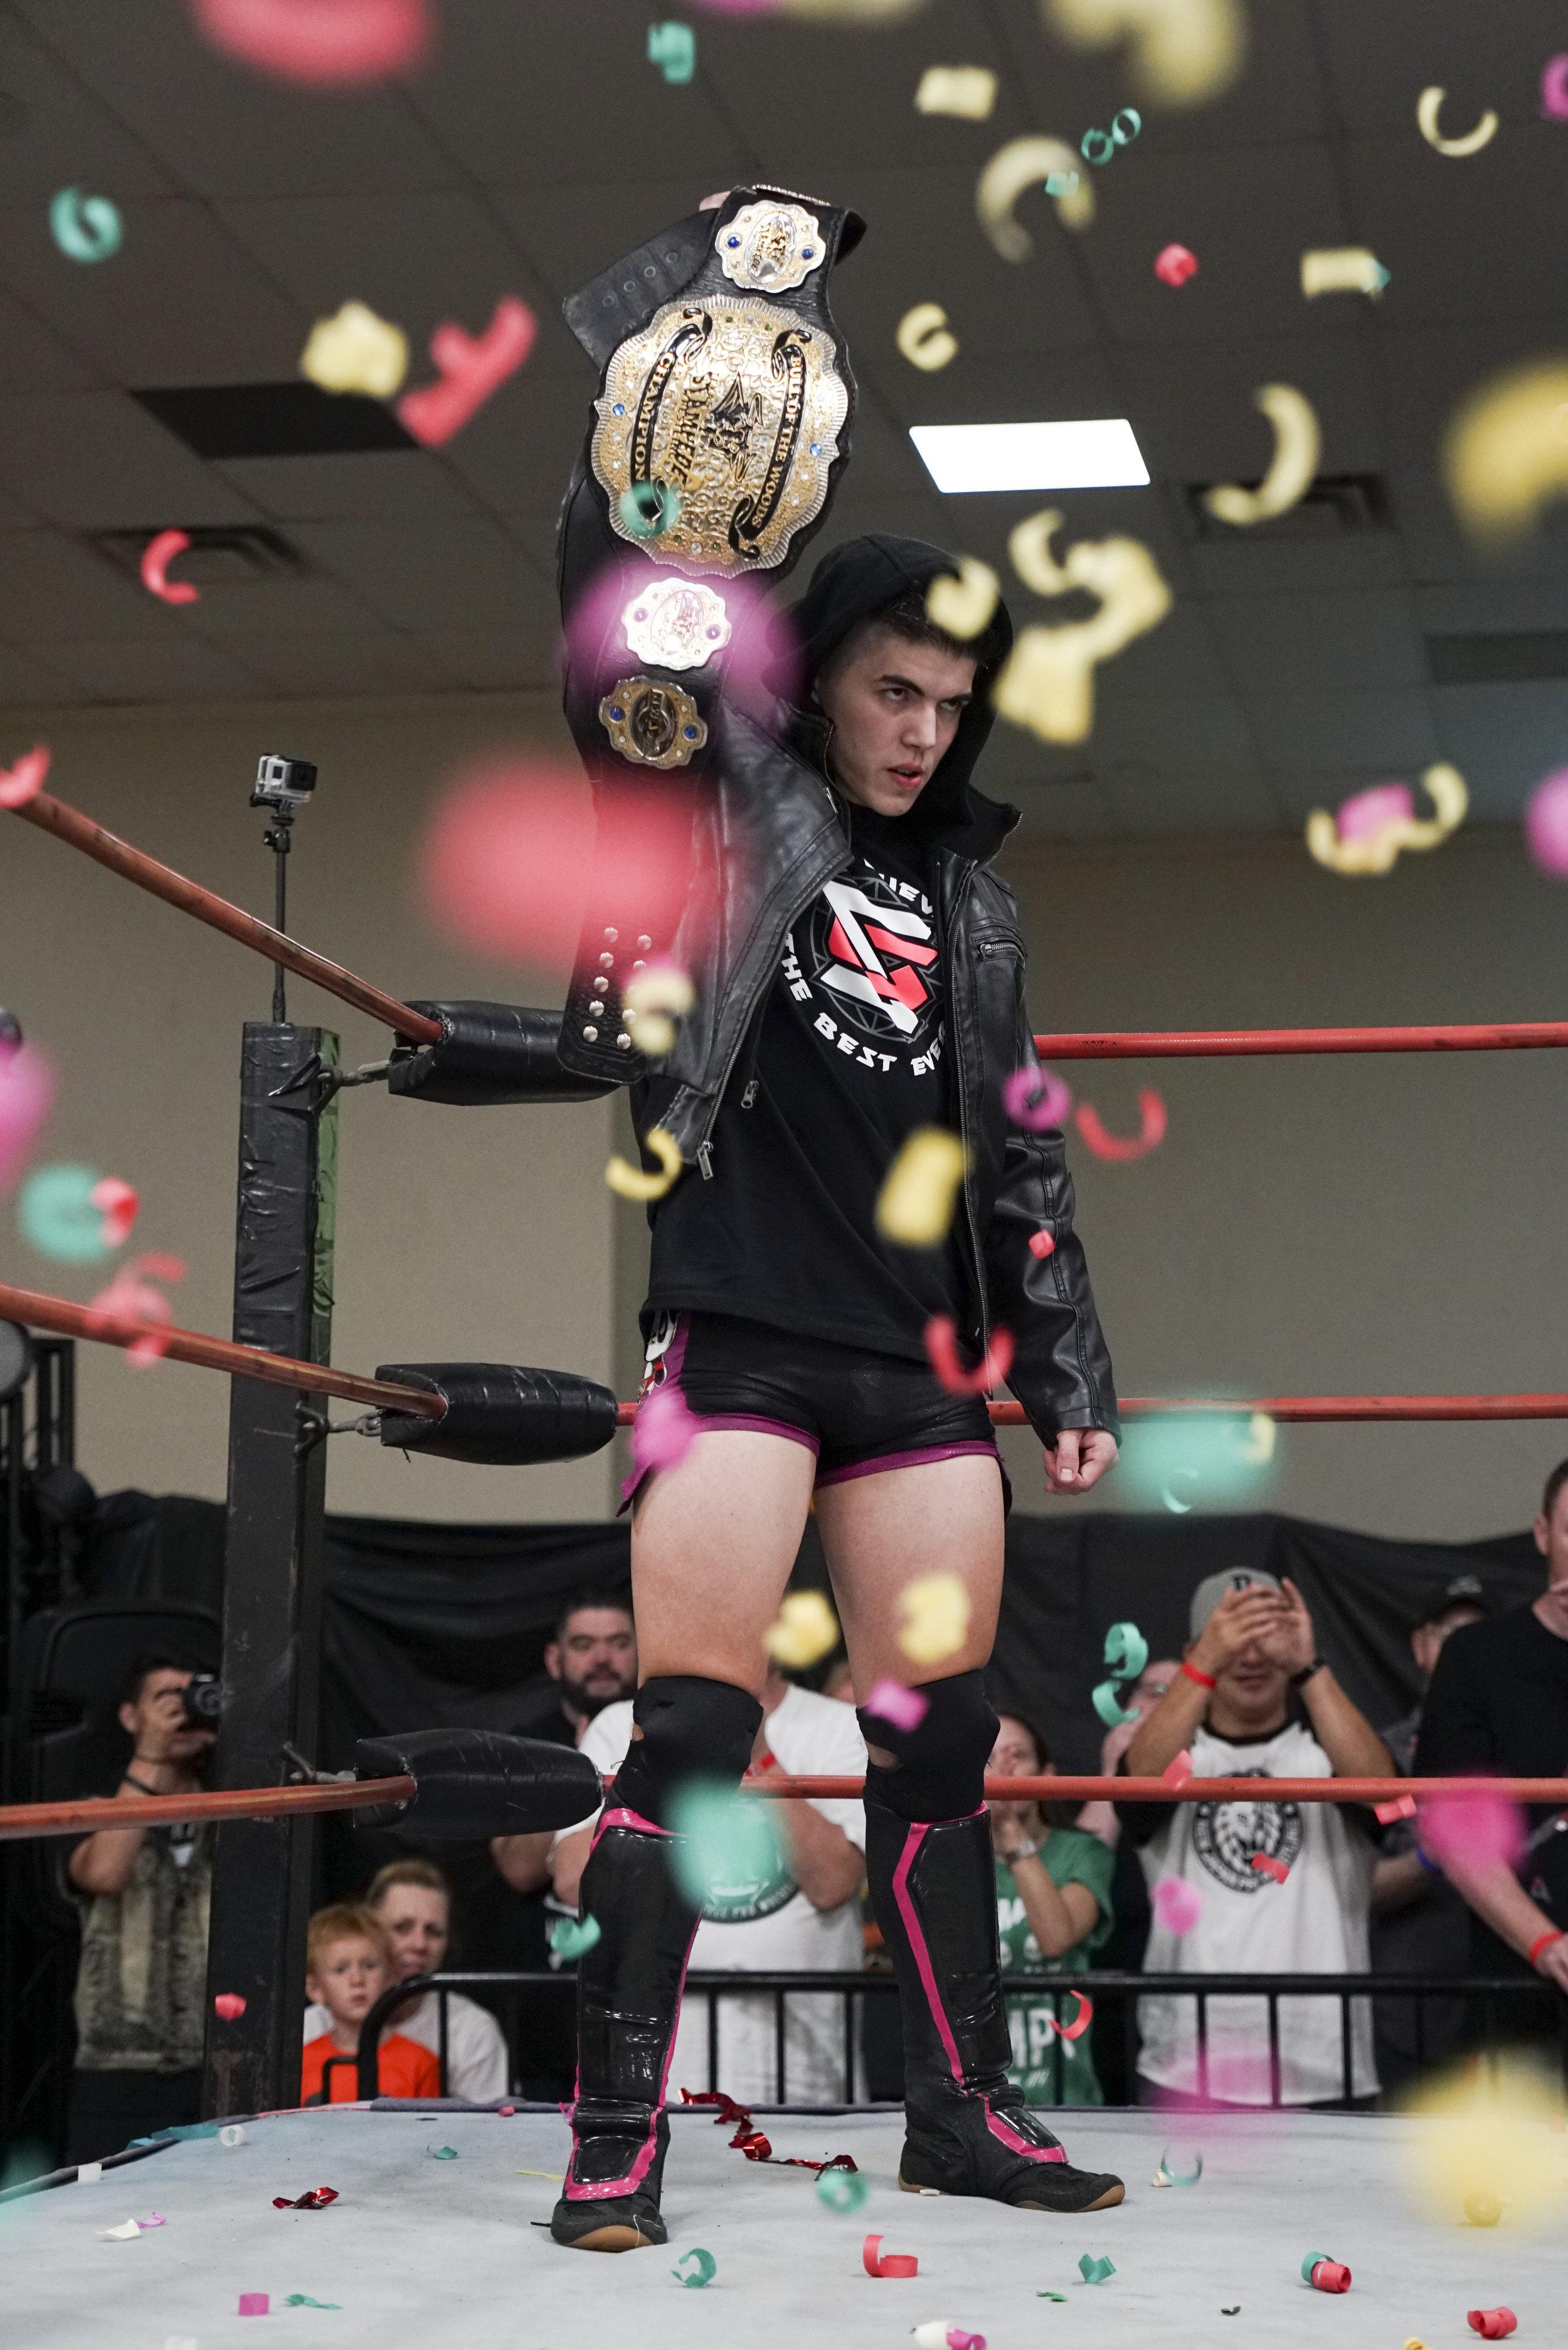 VIP Wrestling star Sammy Guevara holding his Championship